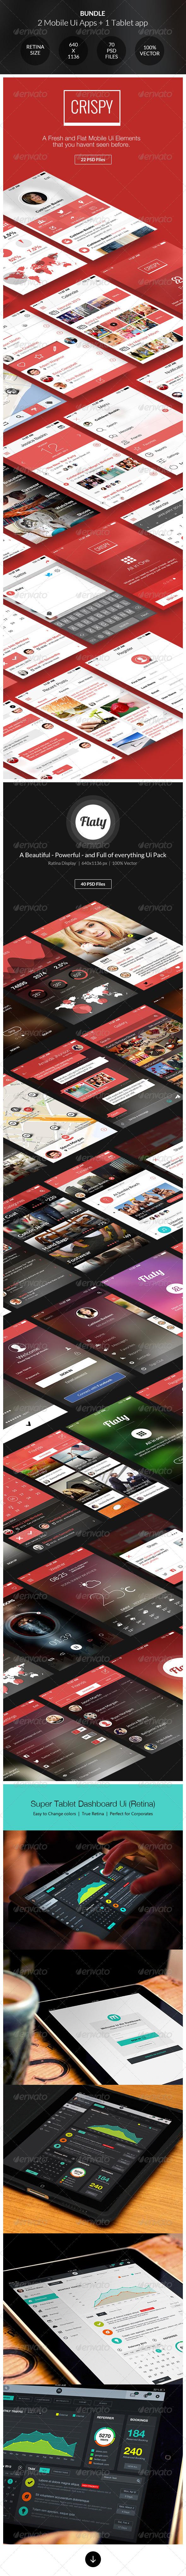 GraphicRiver Bundle 2 Mobile Apps Ui & 1 Tablet App Ui 7952949